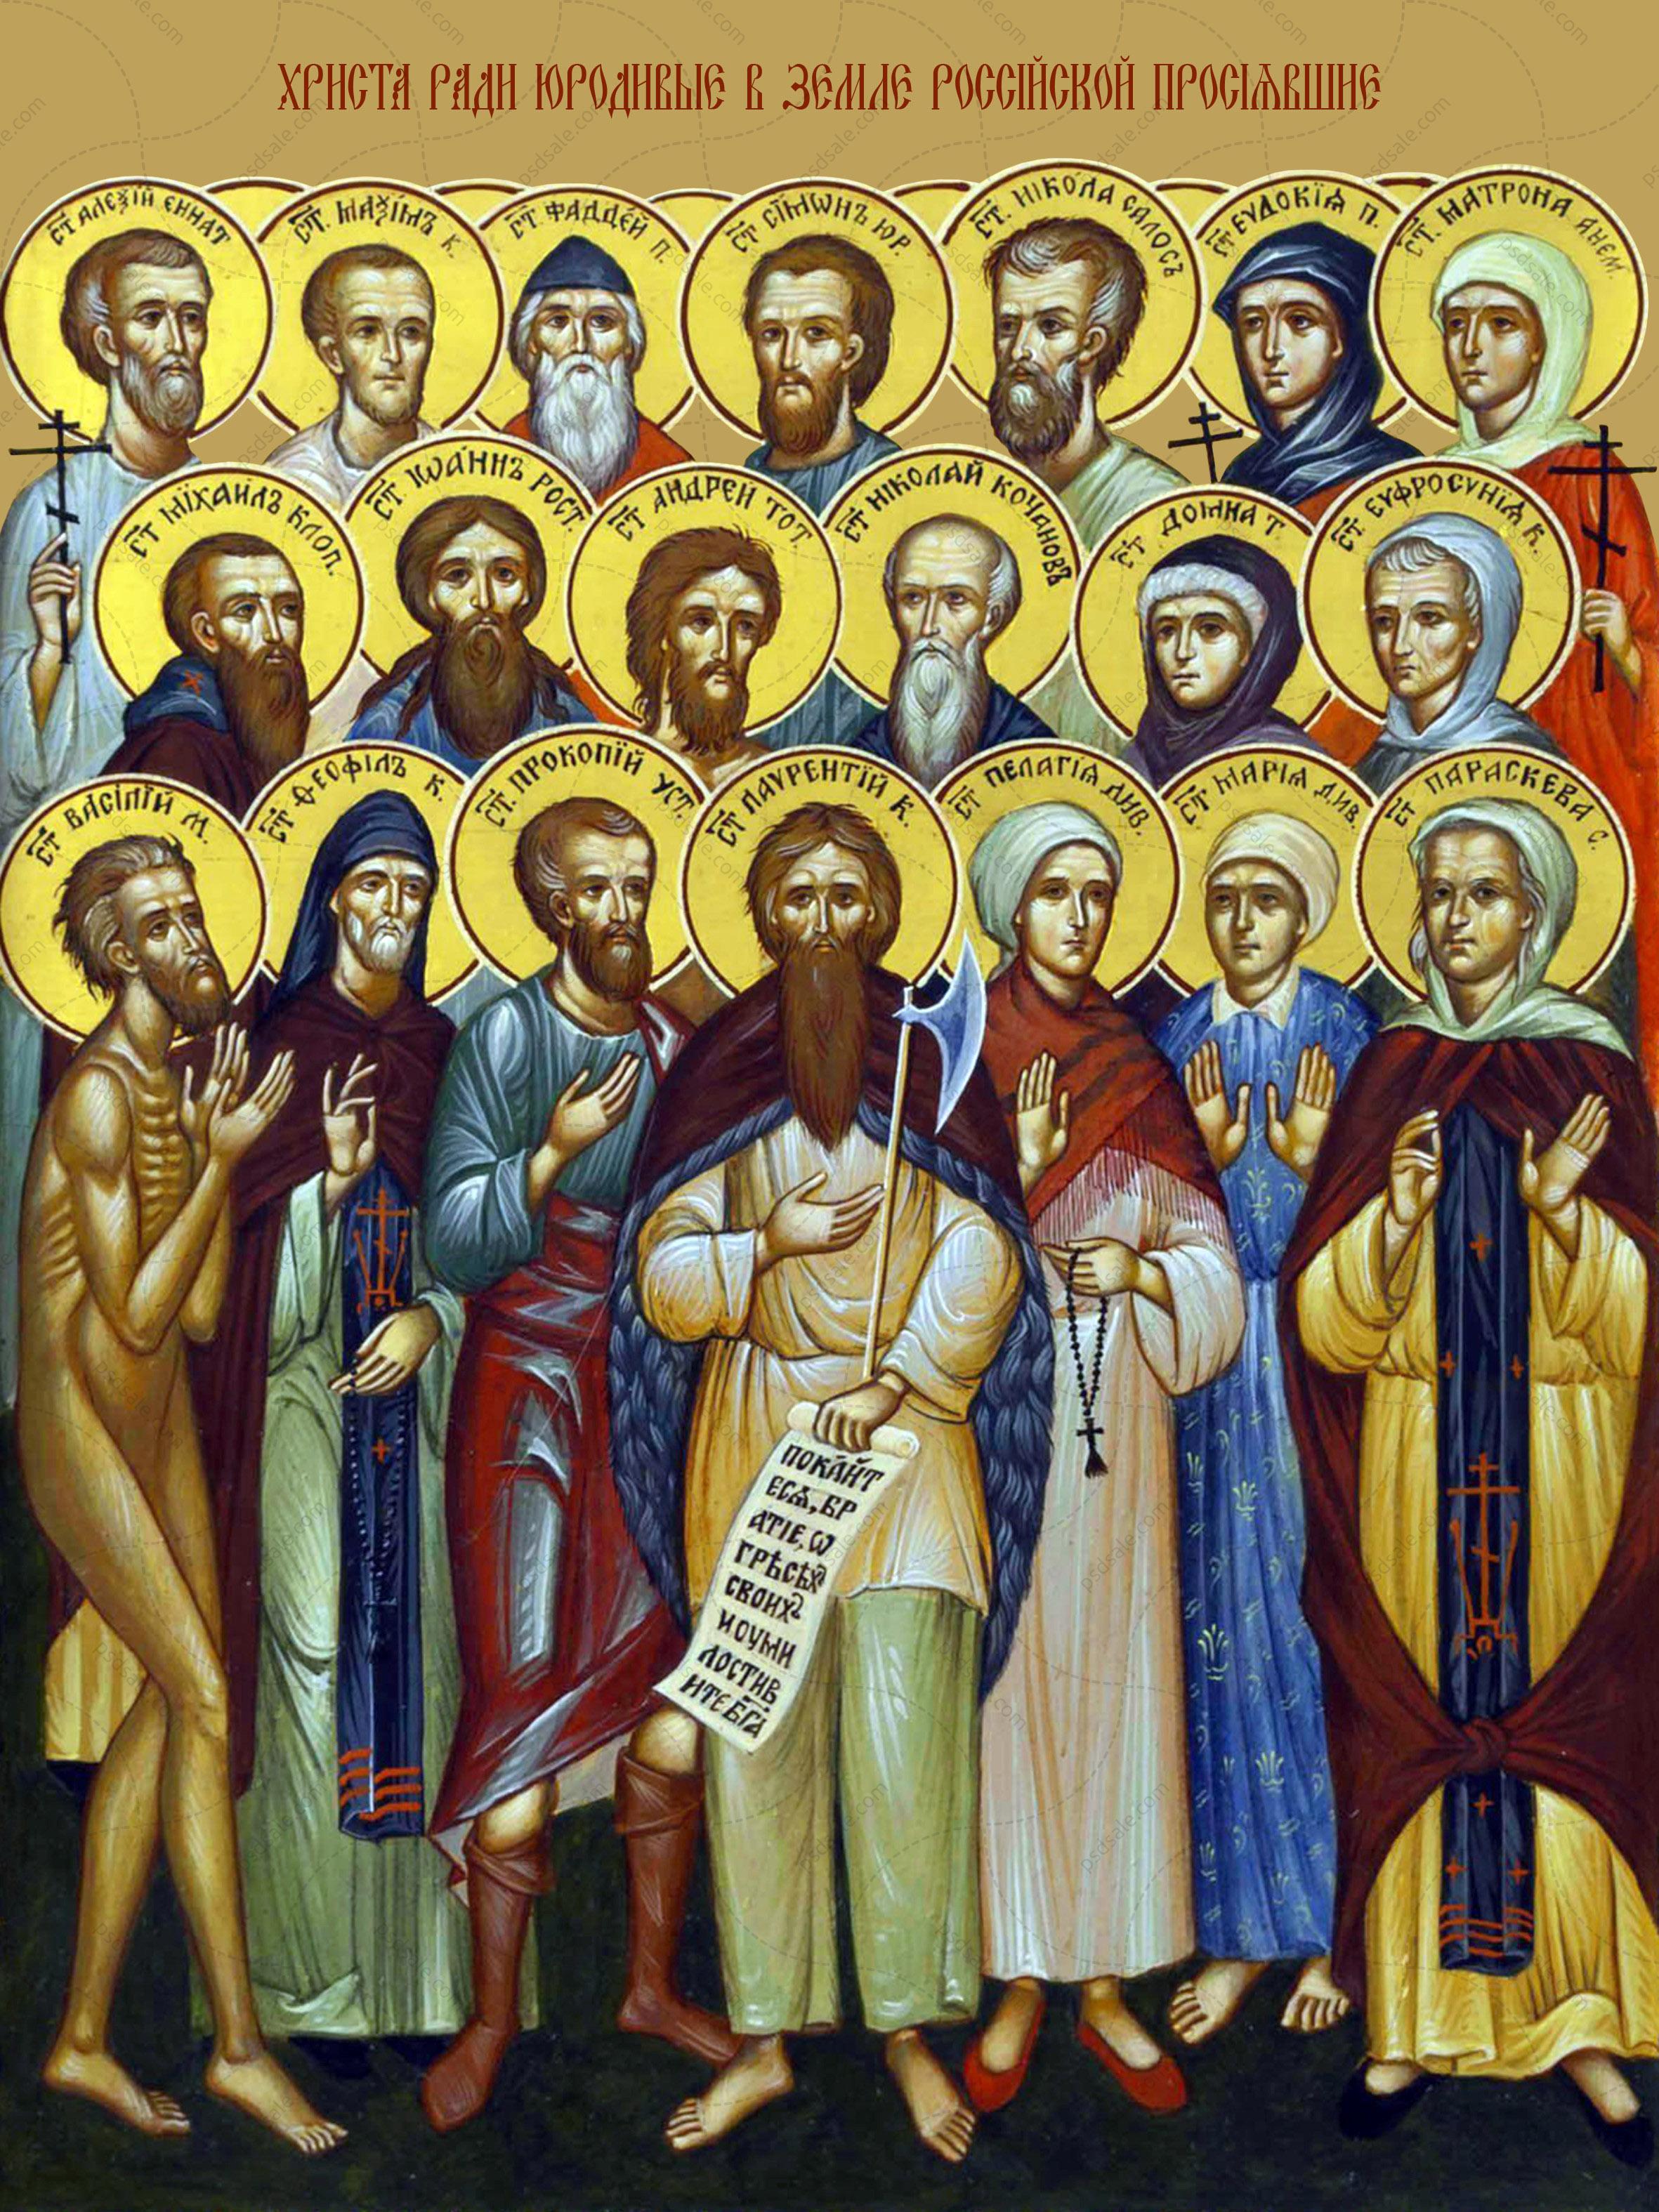 Христа ради юродивые